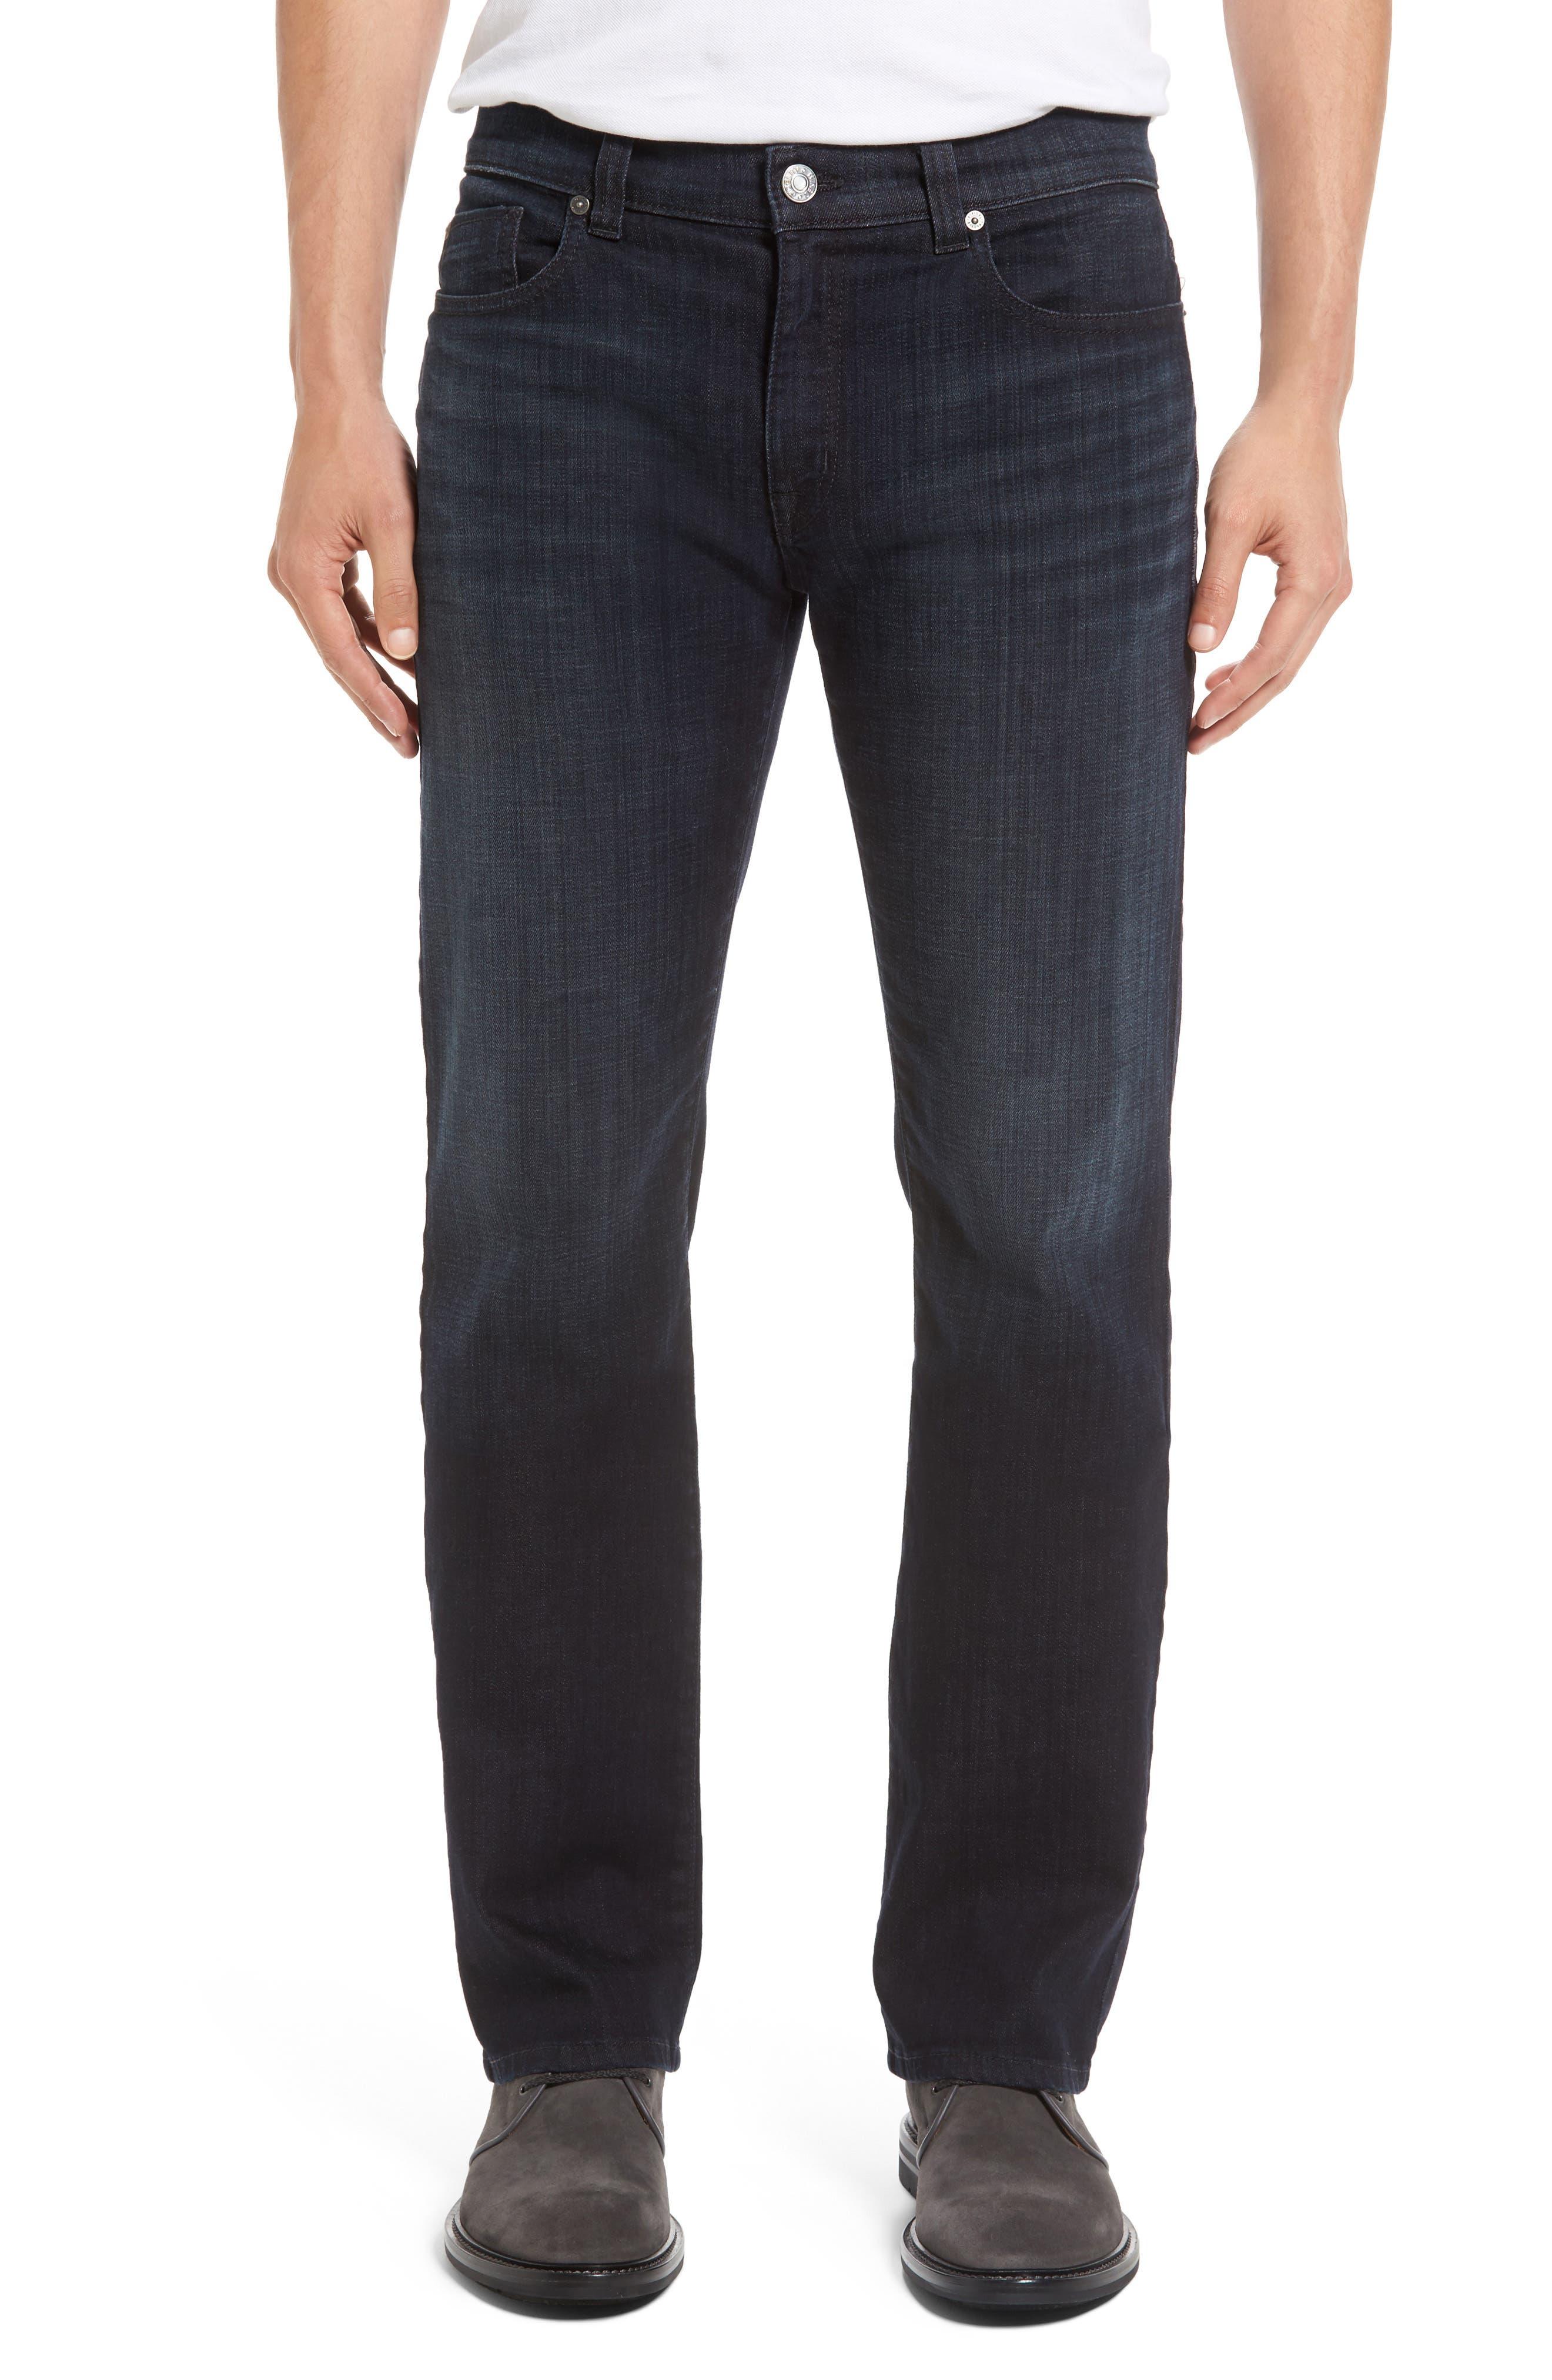 Alternate Image 1 Selected - Fidelity Denim 5011 Relaxed Fit Jeans (Harvard)